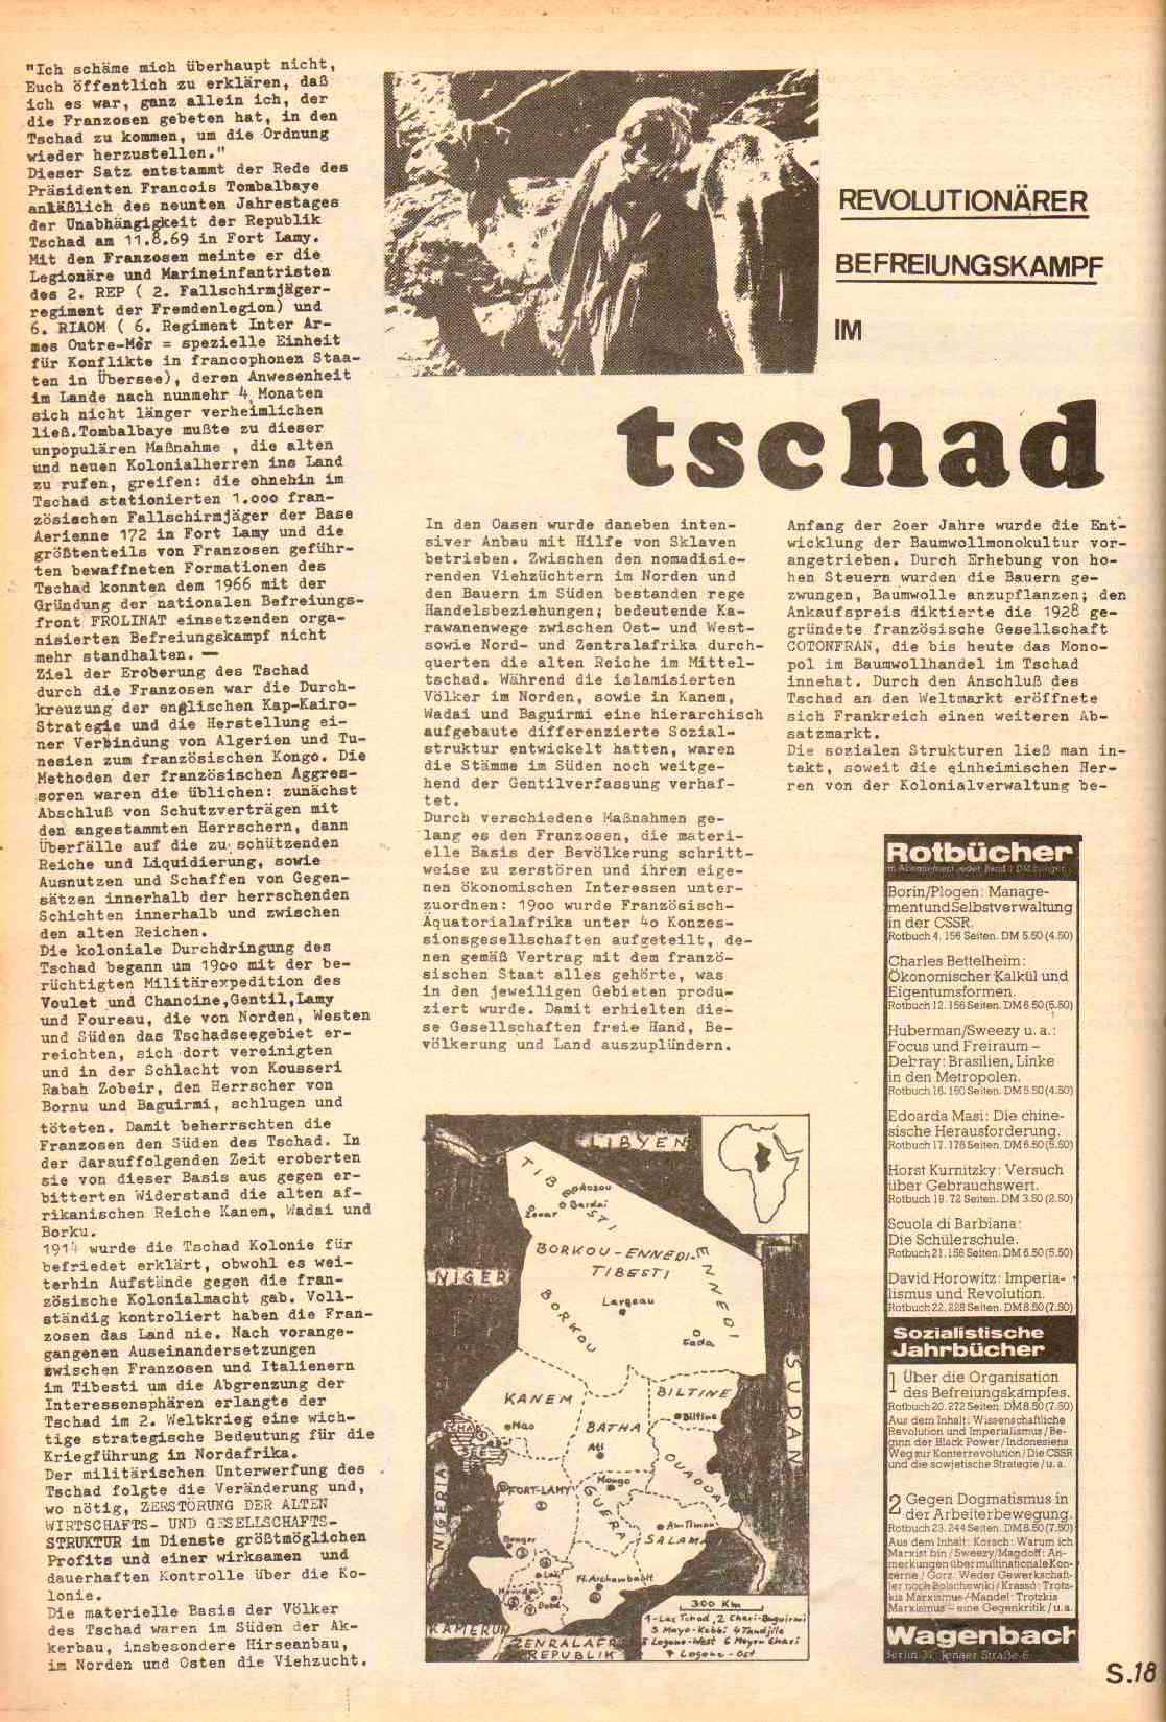 Berlin_Hochschulkampf_1971_04_18